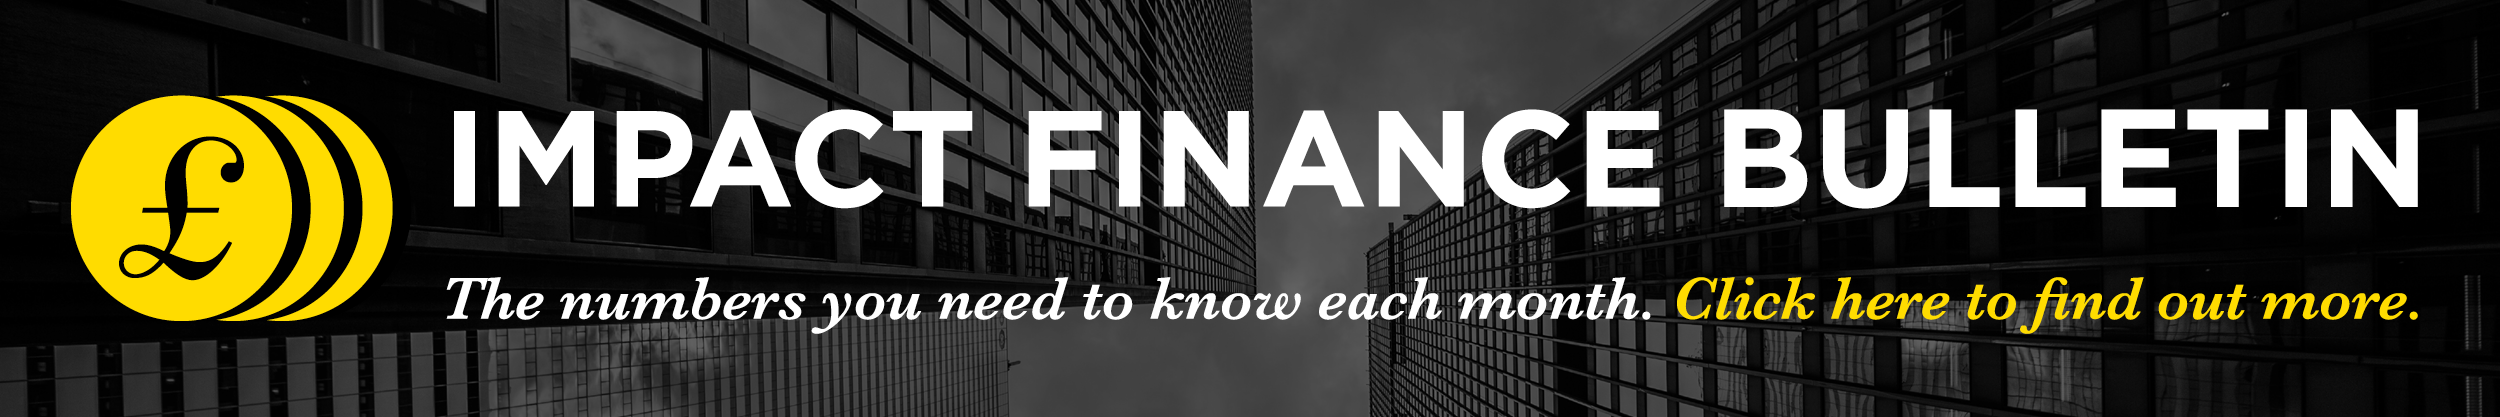 Impact Finance Bulletin